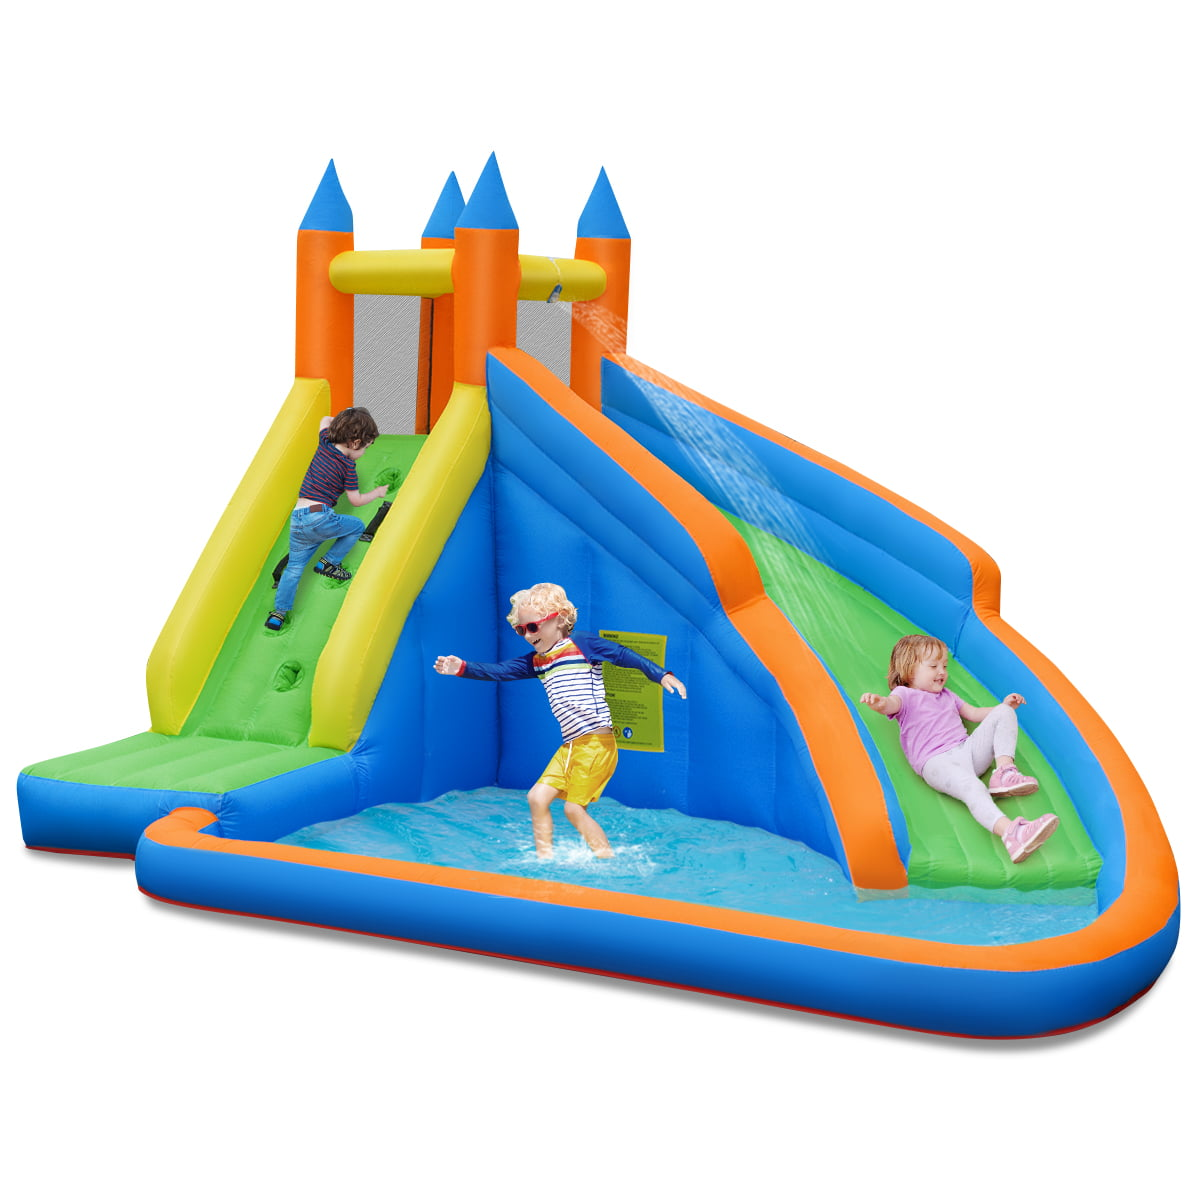 Costway Inflatable Water Slide Mighty Bounce House Jumper Castle Moonwalk Without Blower Walmart Com Walmart Com